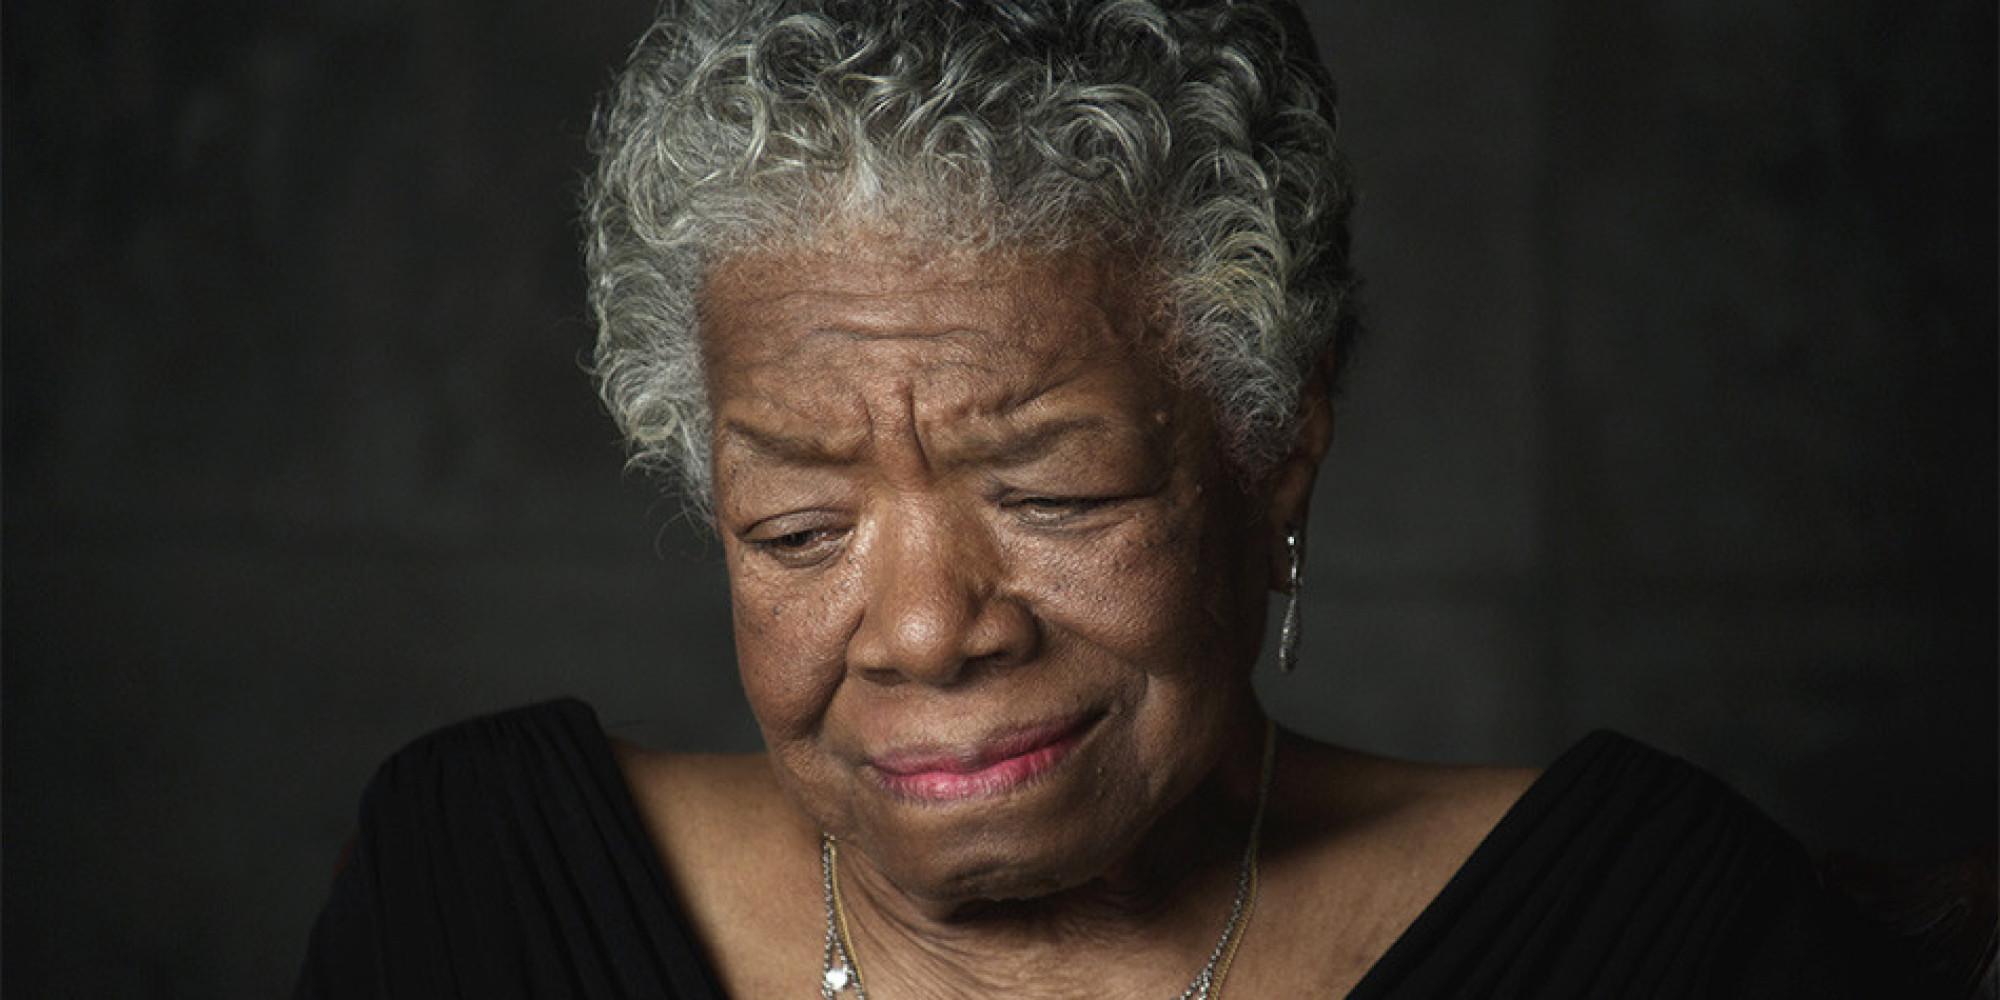 What Influenced Maya Angelou to Write?